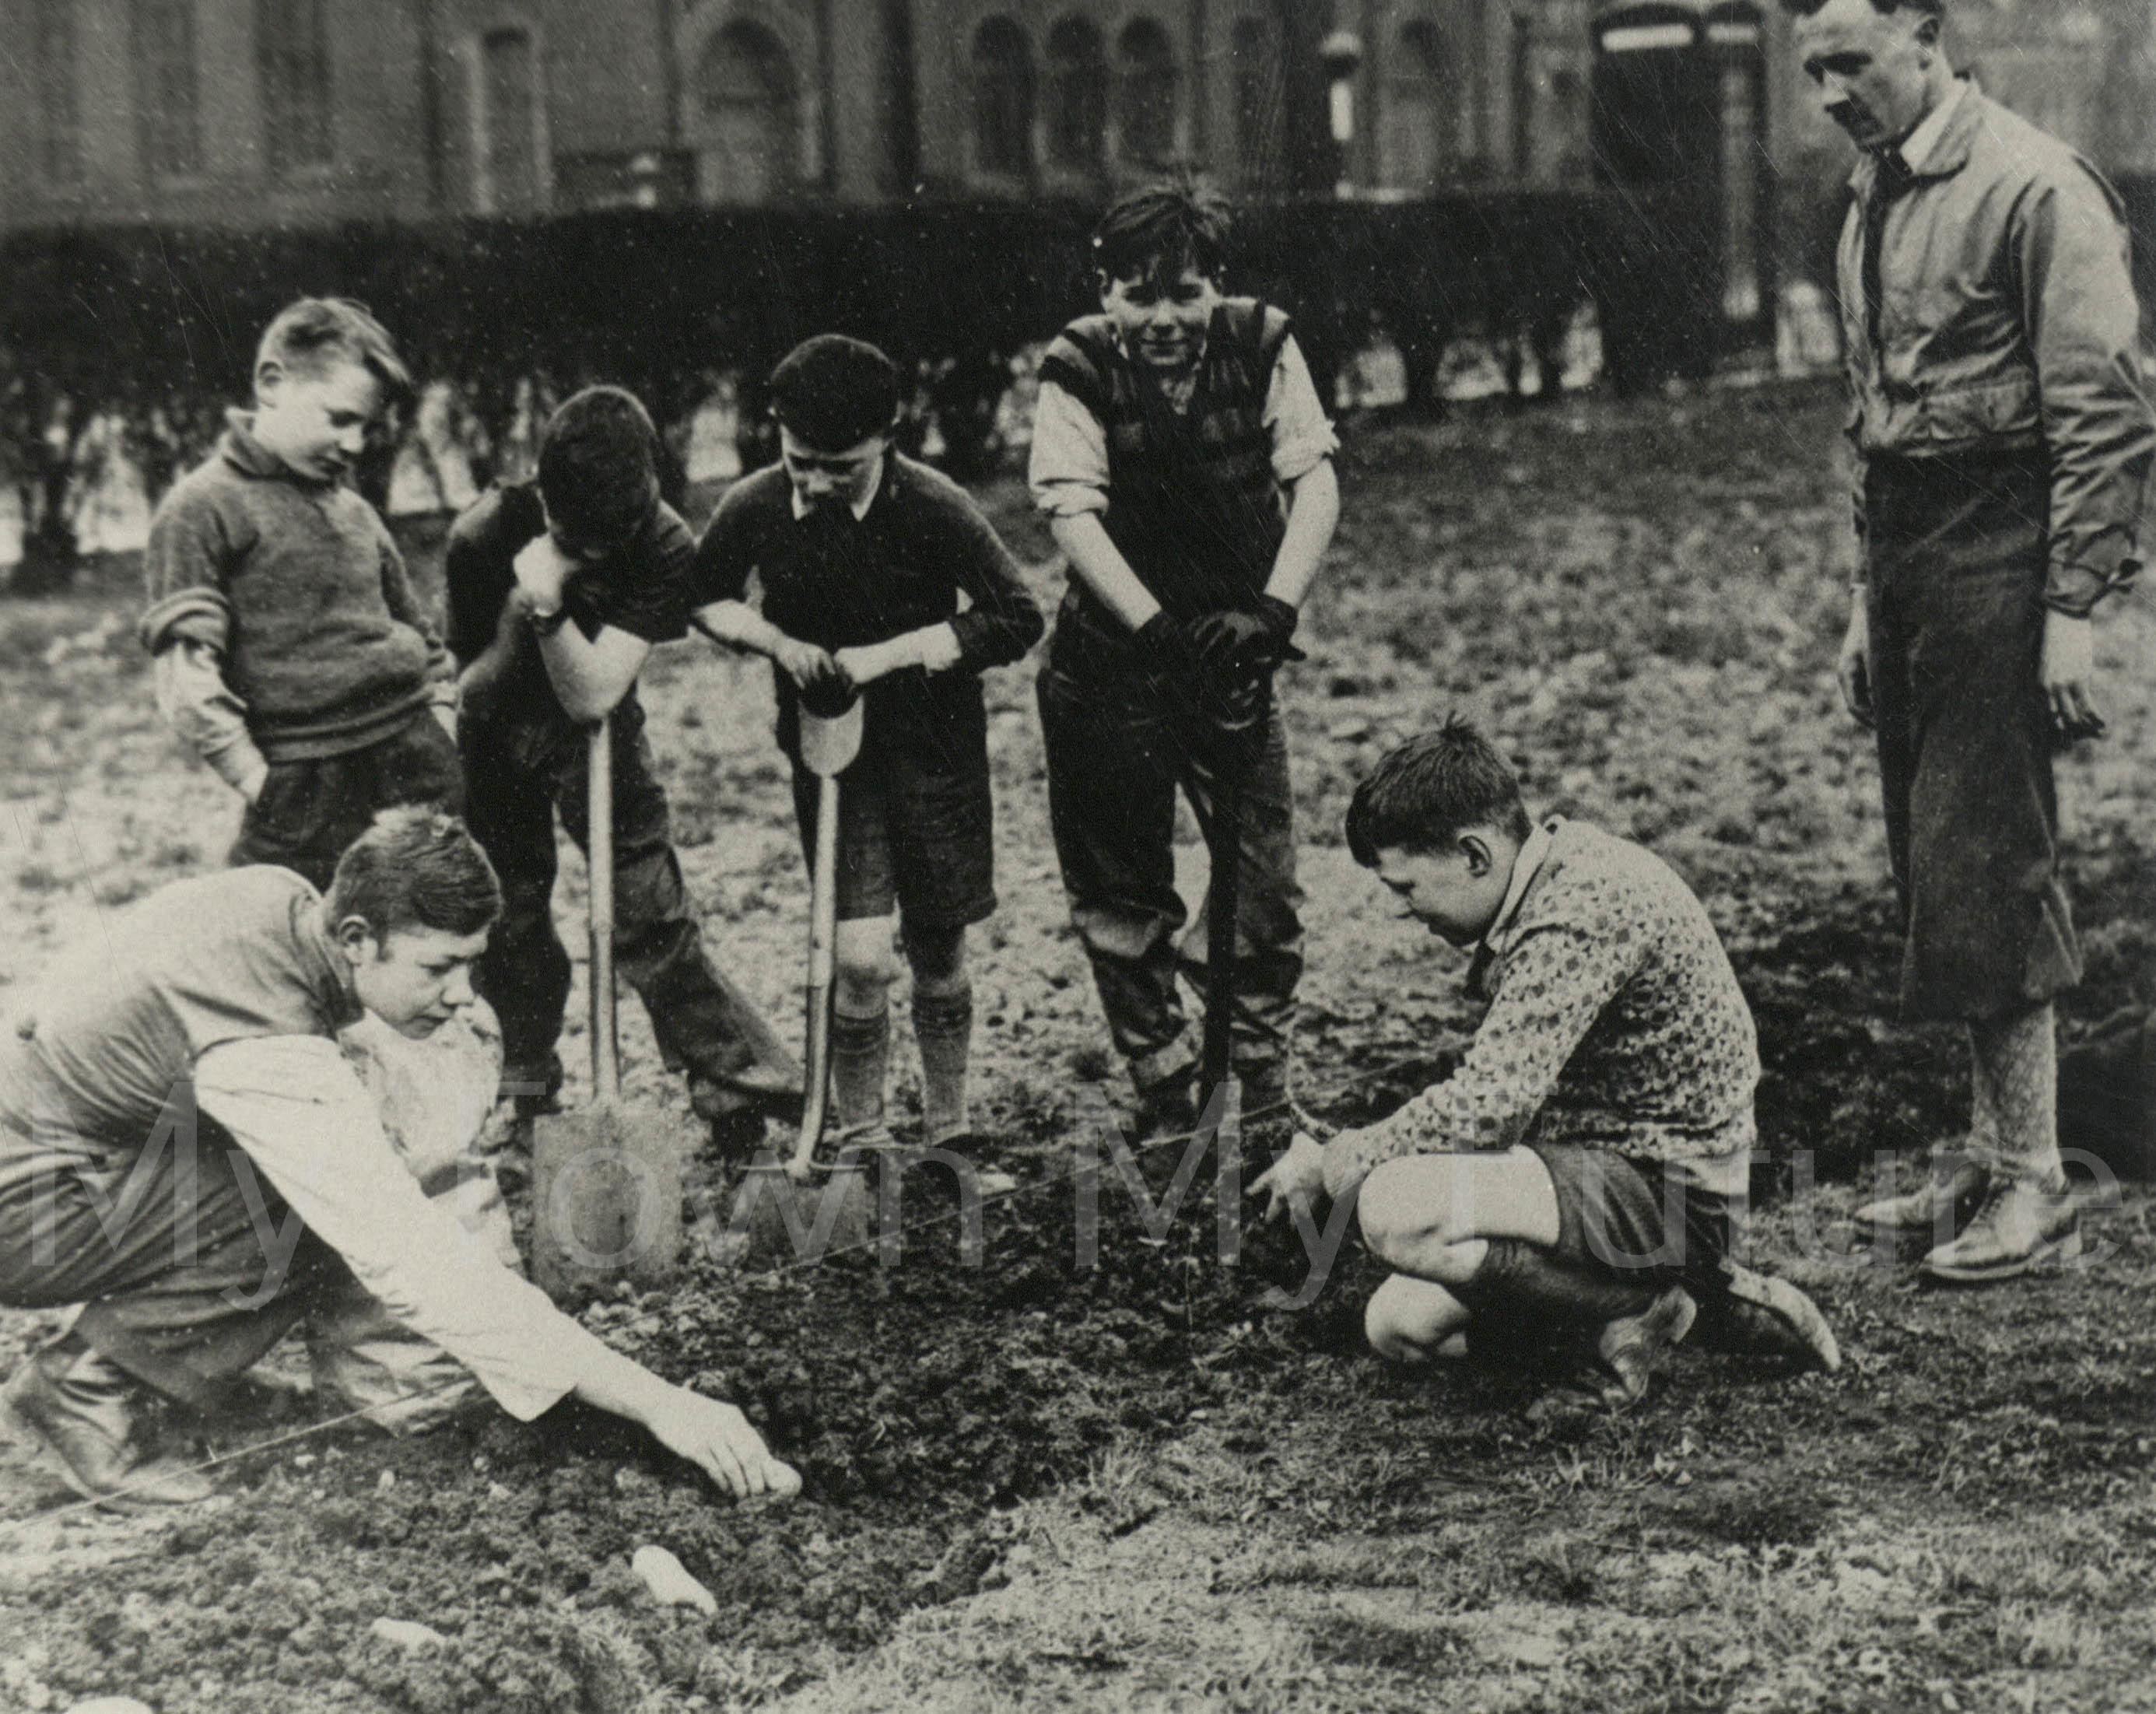 World War II,Archibald School,Teacher 'Stinker' Sterling ,Potato Planting,'Digging for Victory',Albert Park